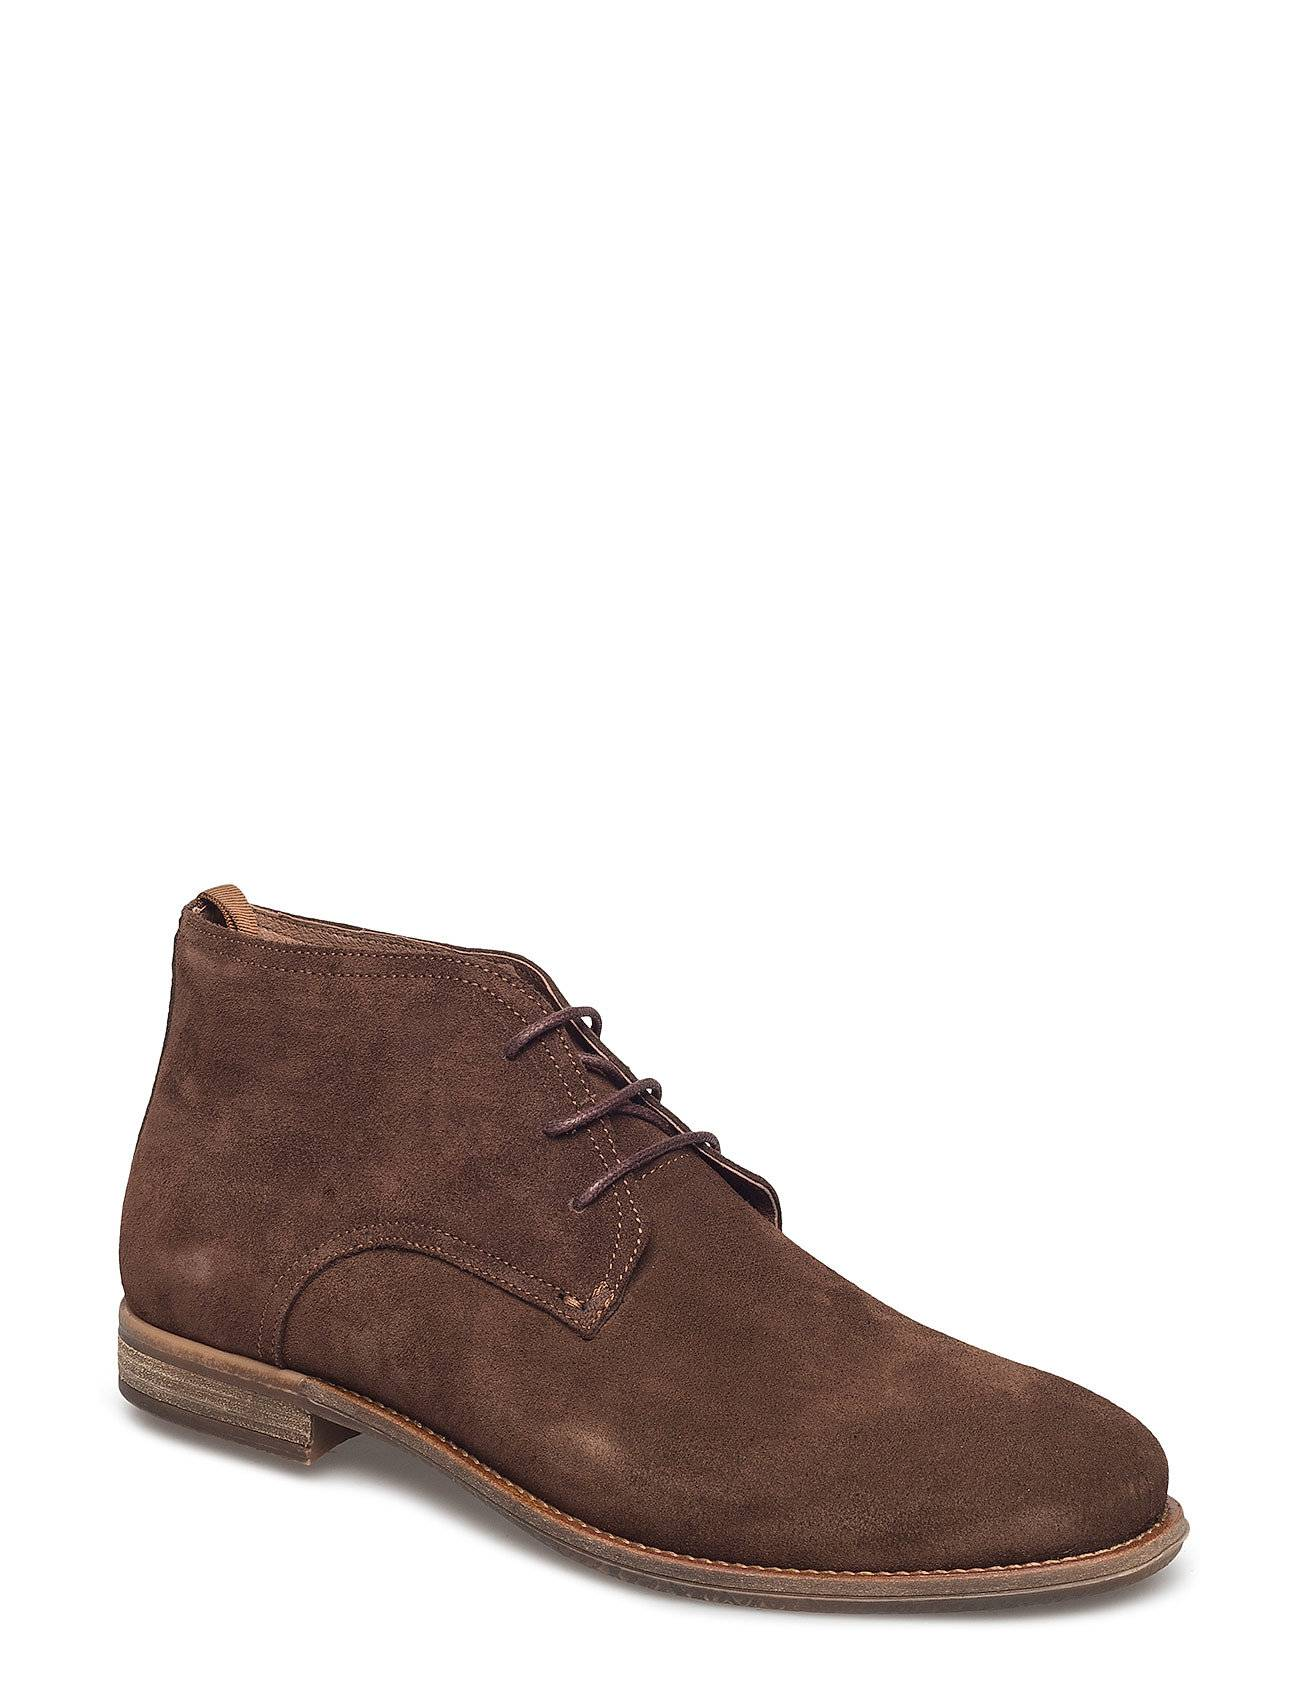 Playboy Footwear Ian